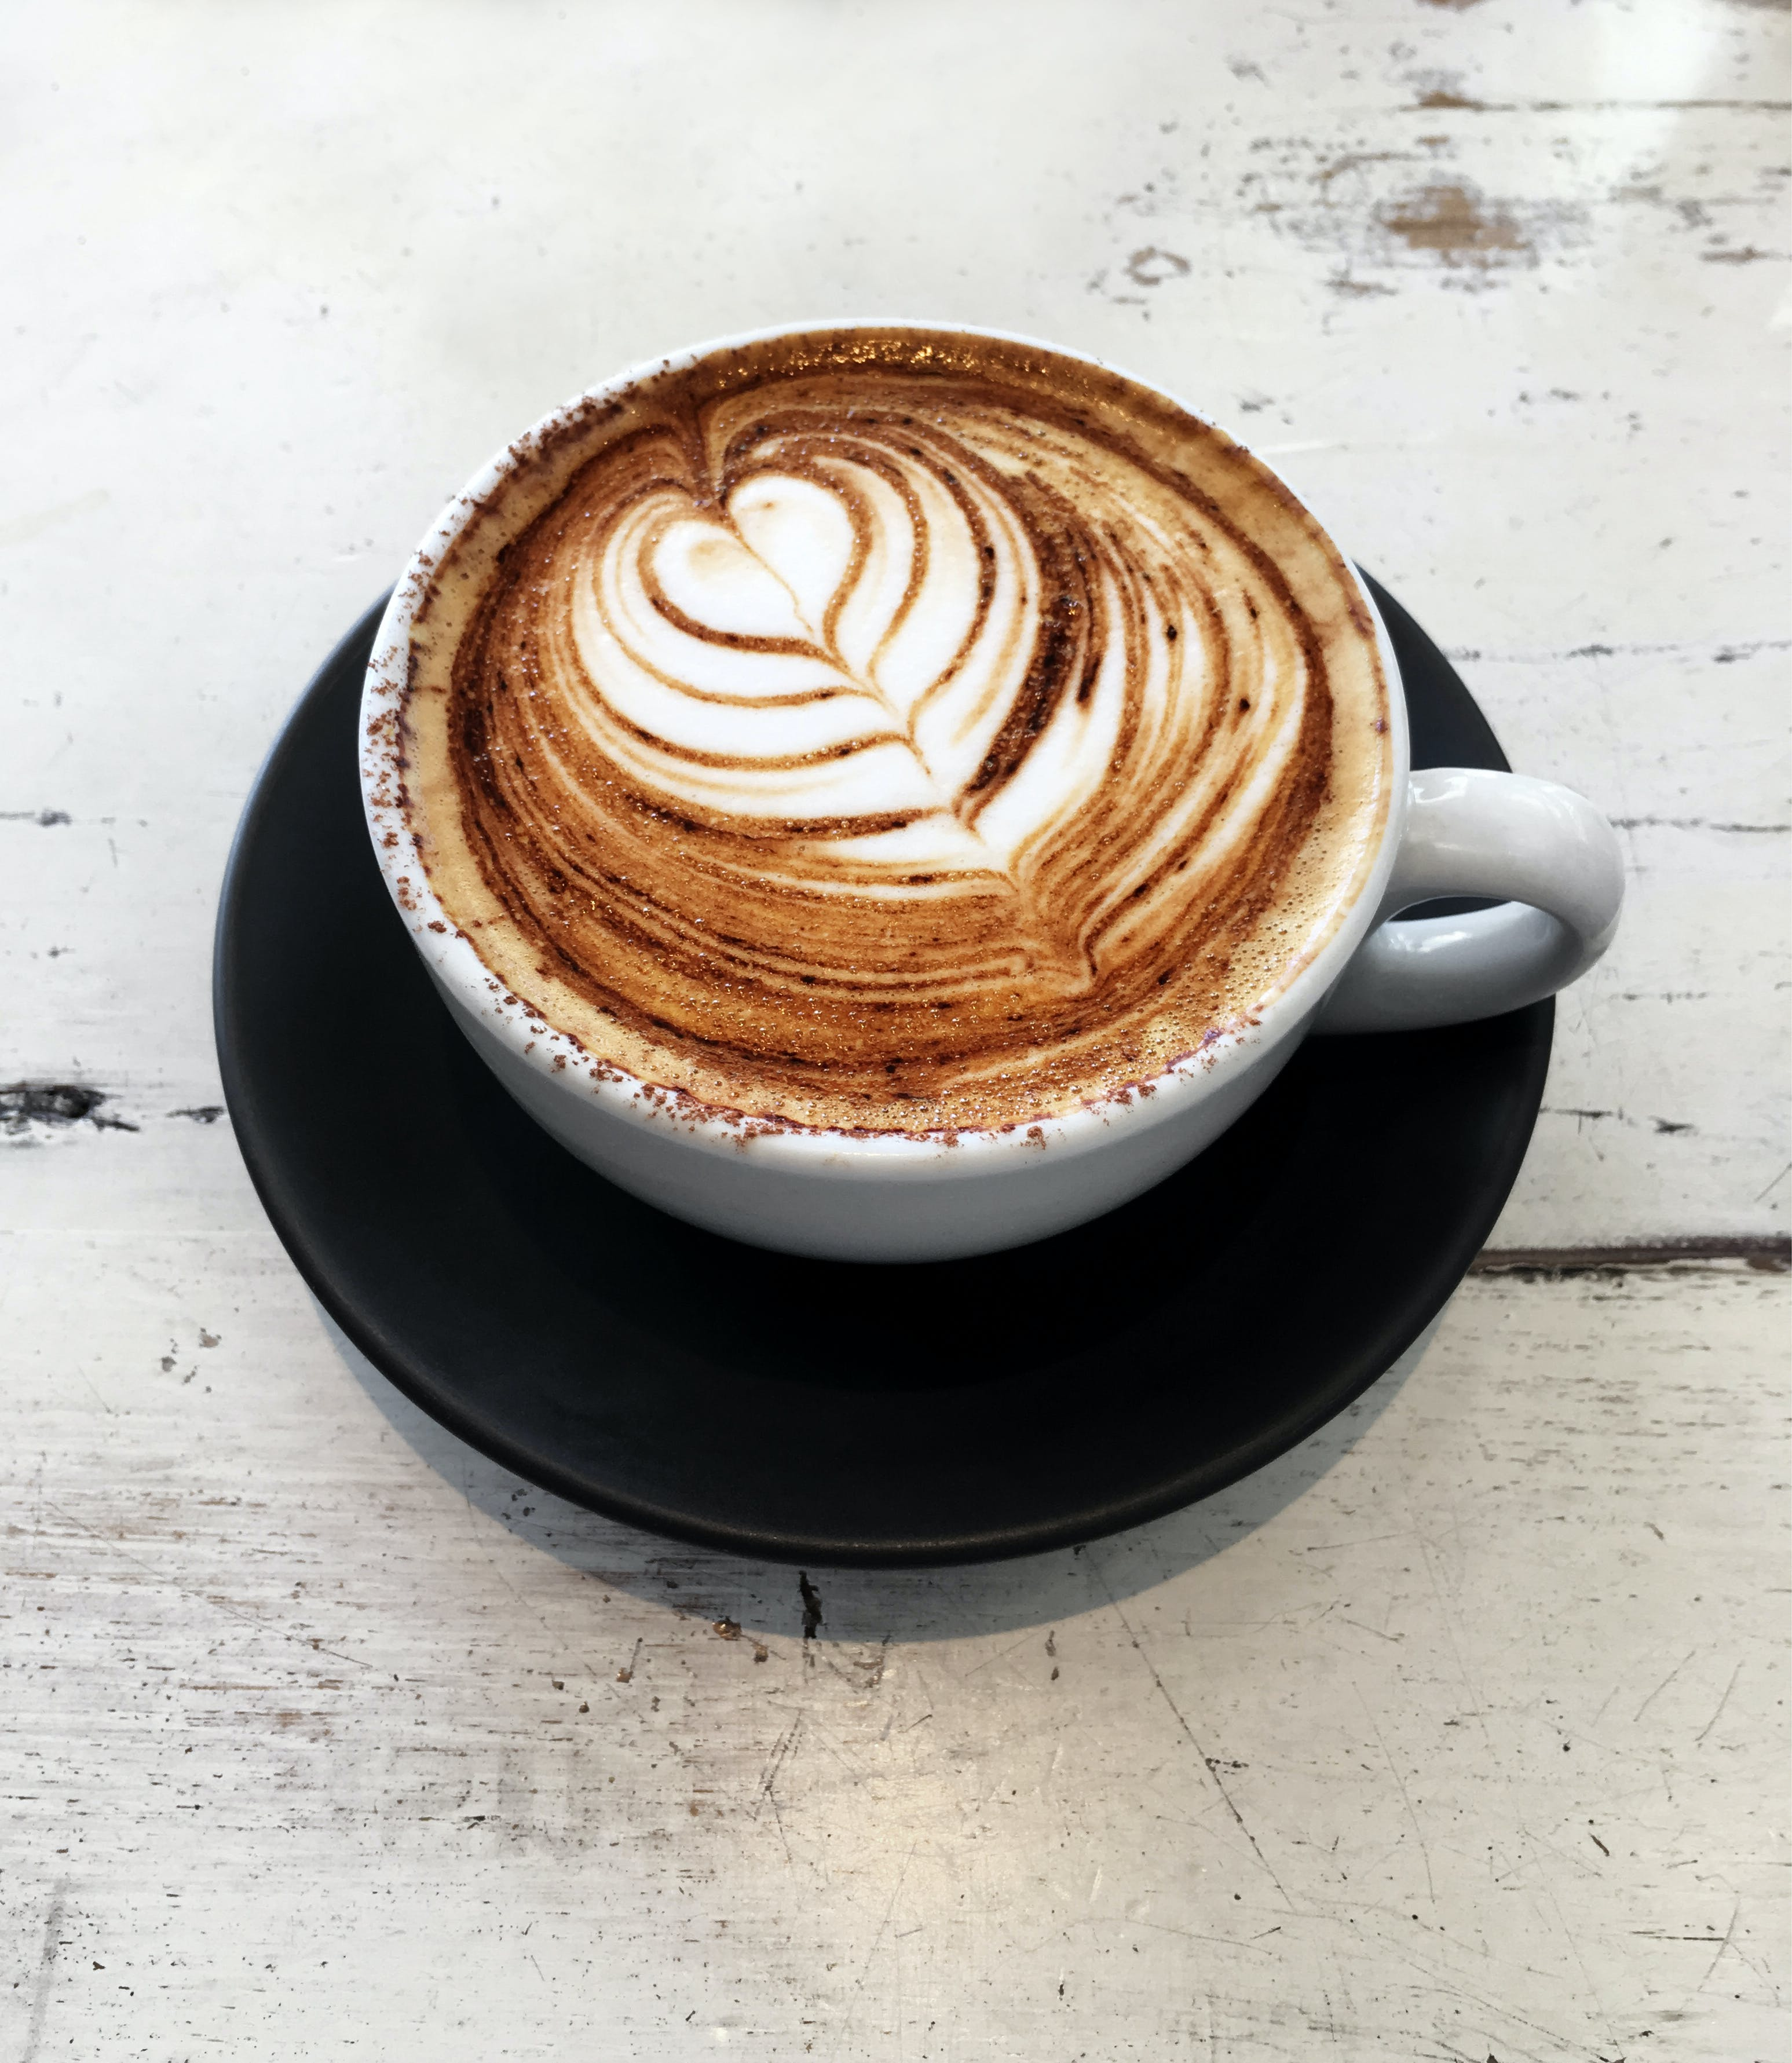 Free stock photo of beverage, breakfast, café, caffeine